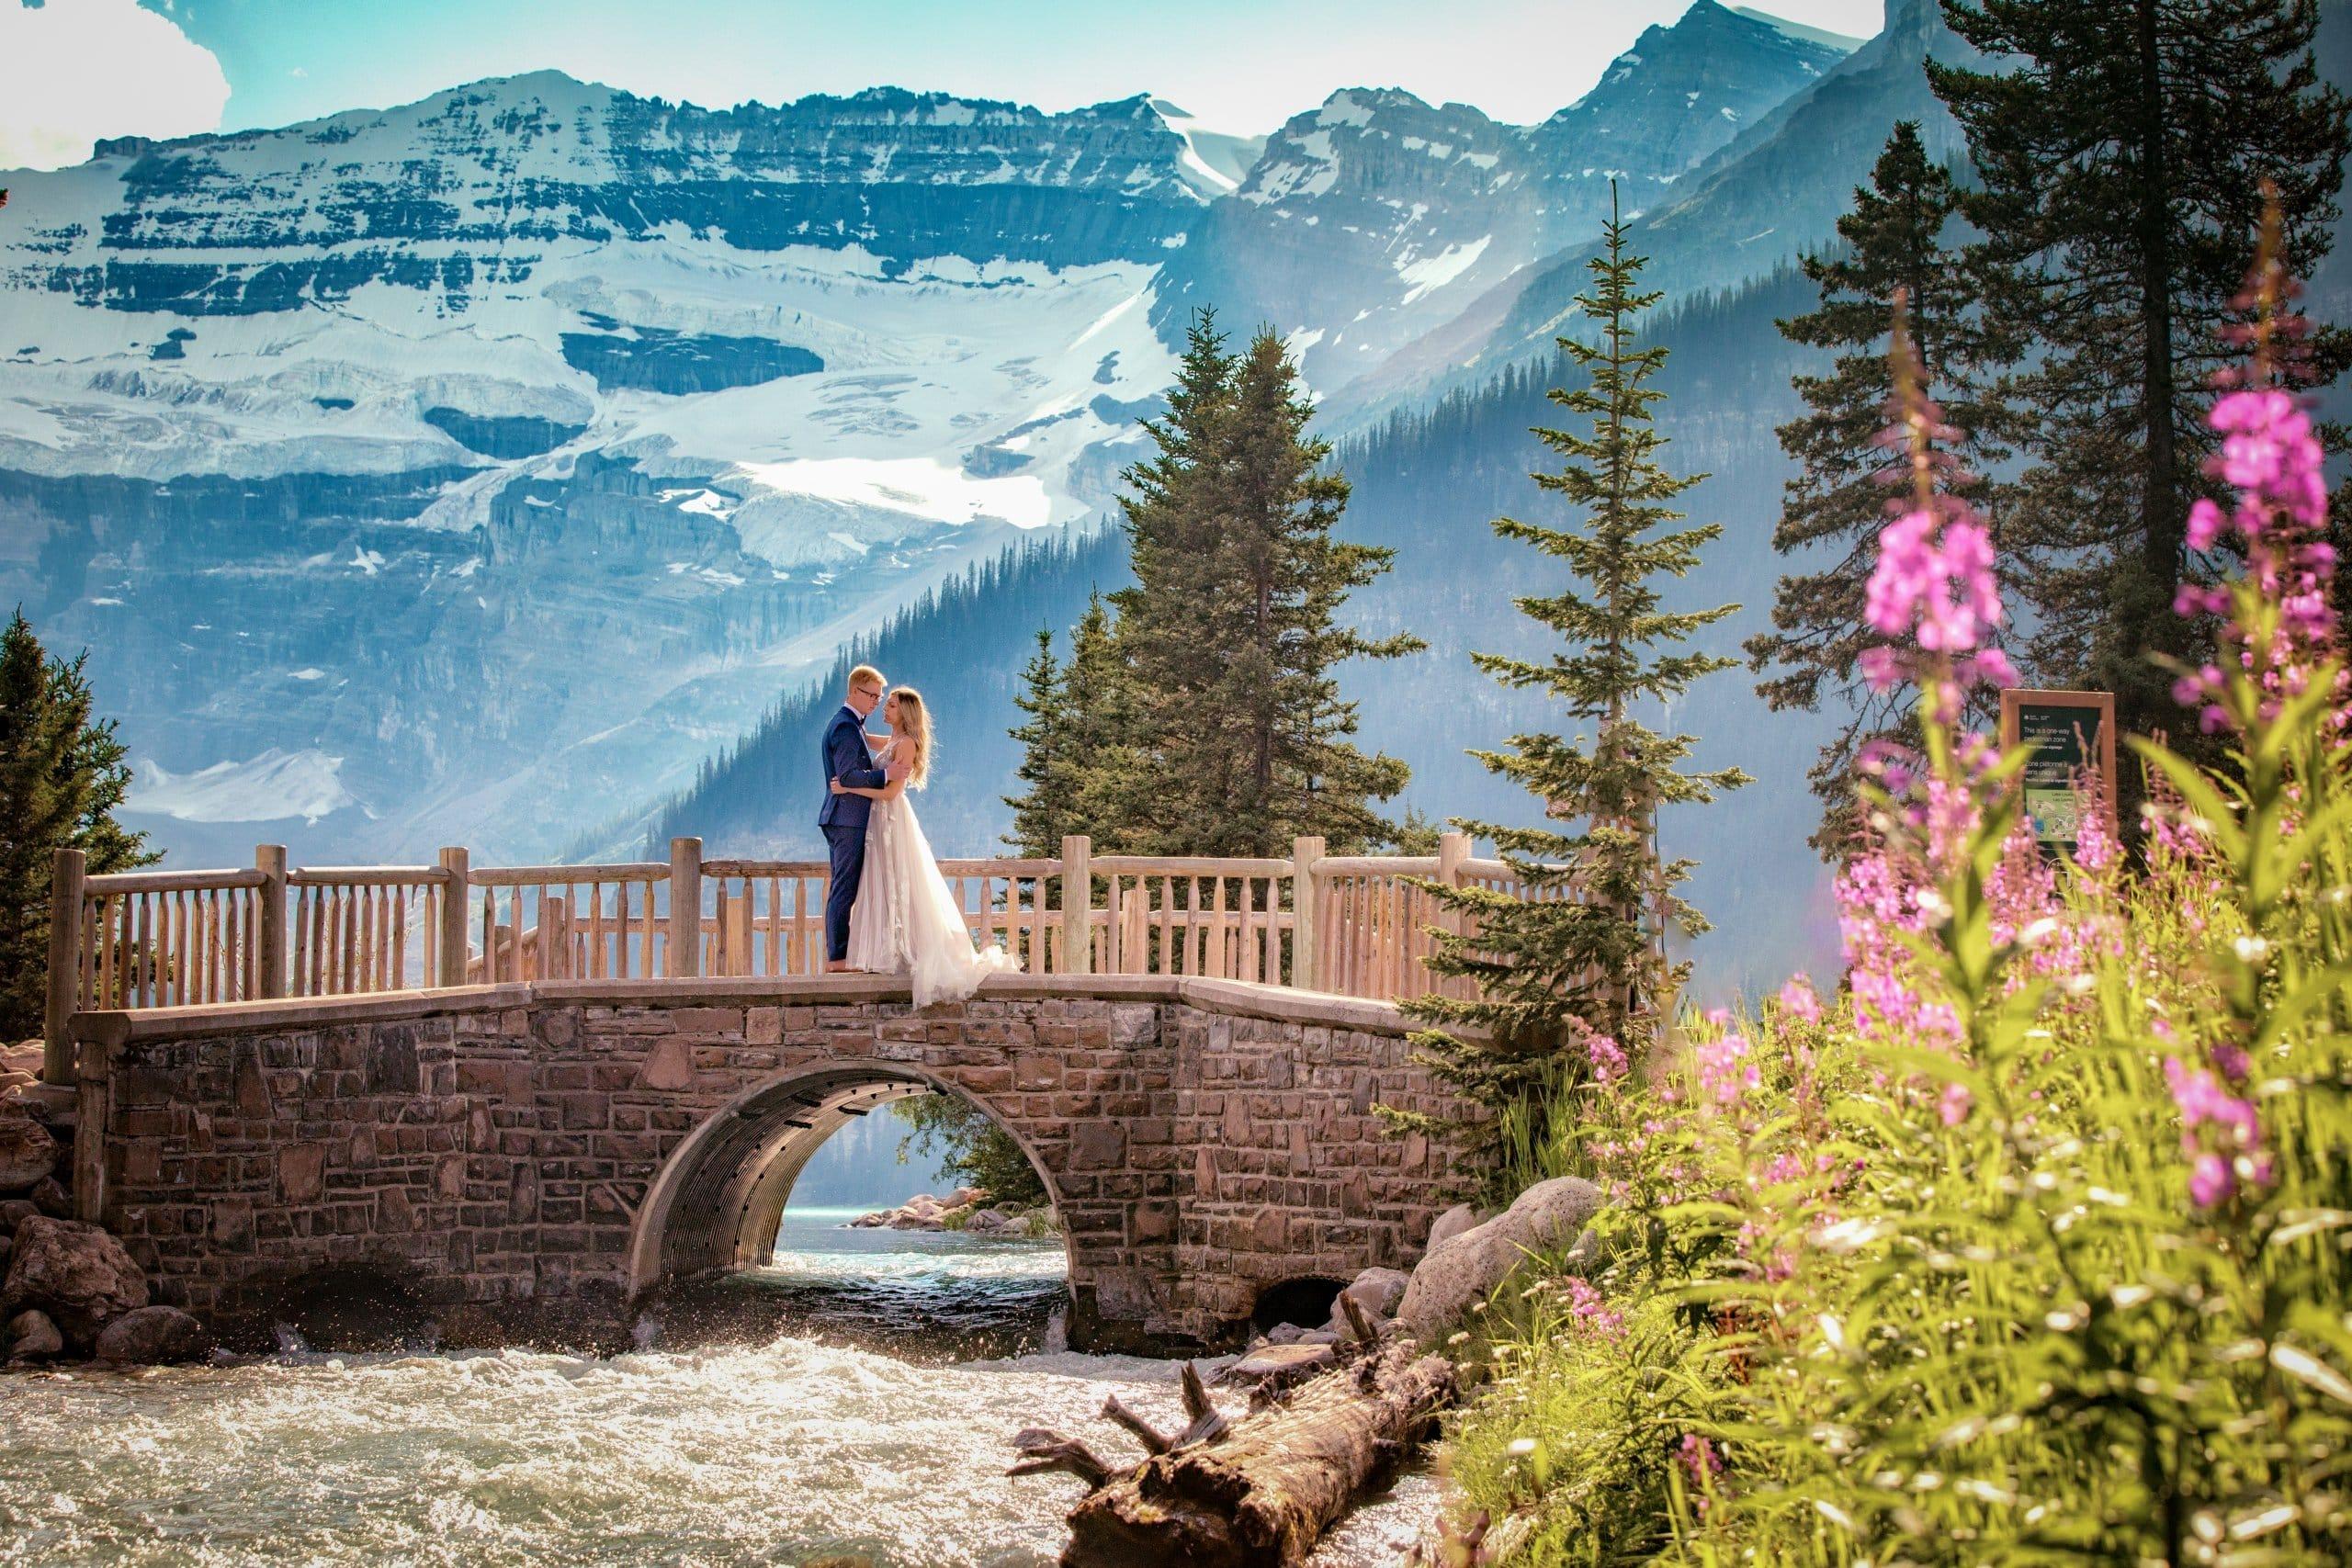 Lake Louise wedding photos by Lake Louise photographers, Burnett Photography at Fairmont Chateau Lake Louise